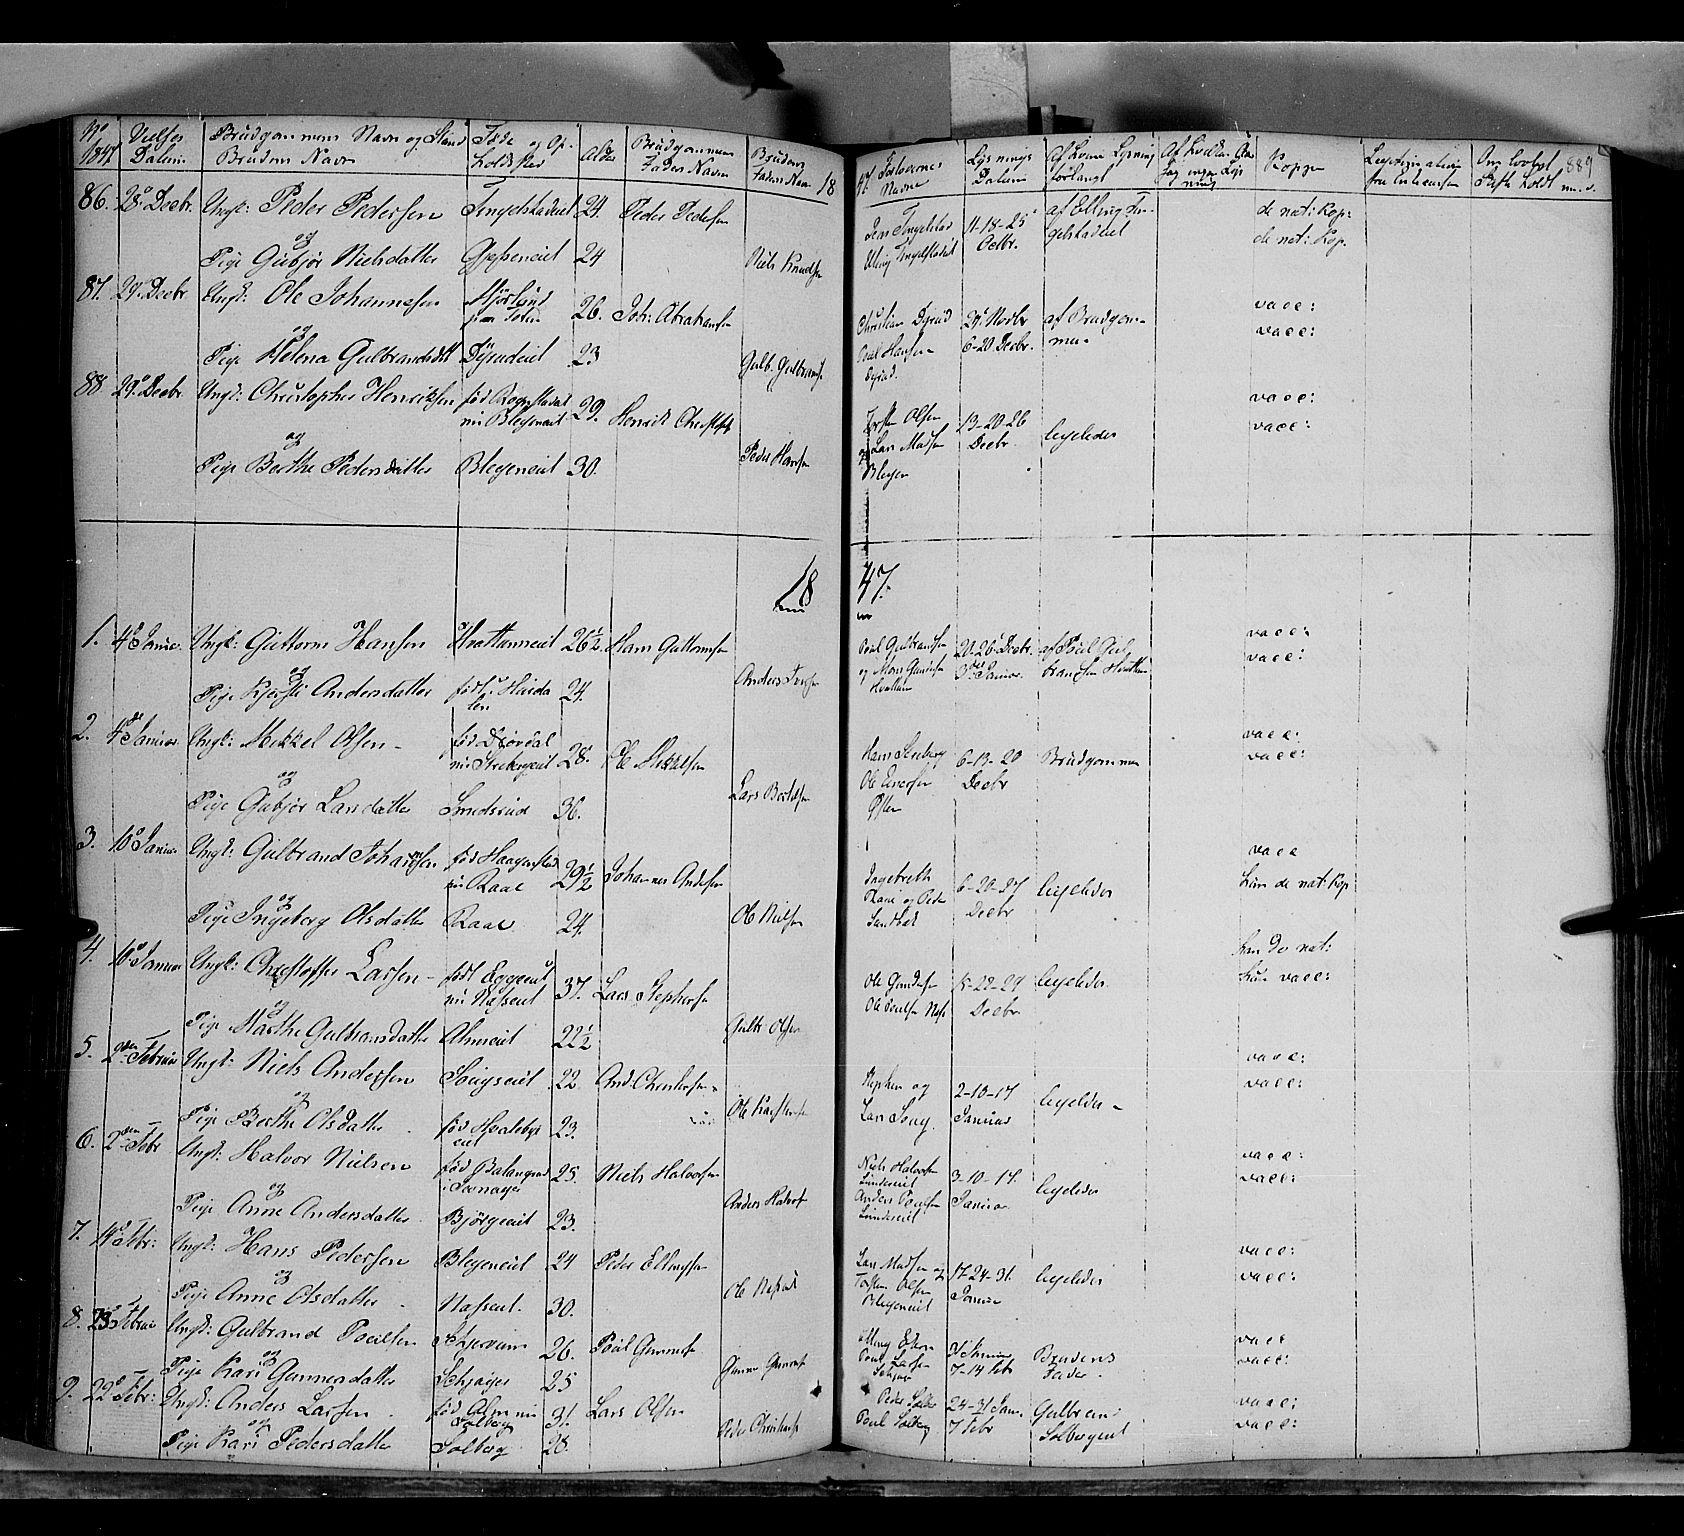 SAH, Gran prestekontor, Ministerialbok nr. 11, 1842-1856, s. 888-889